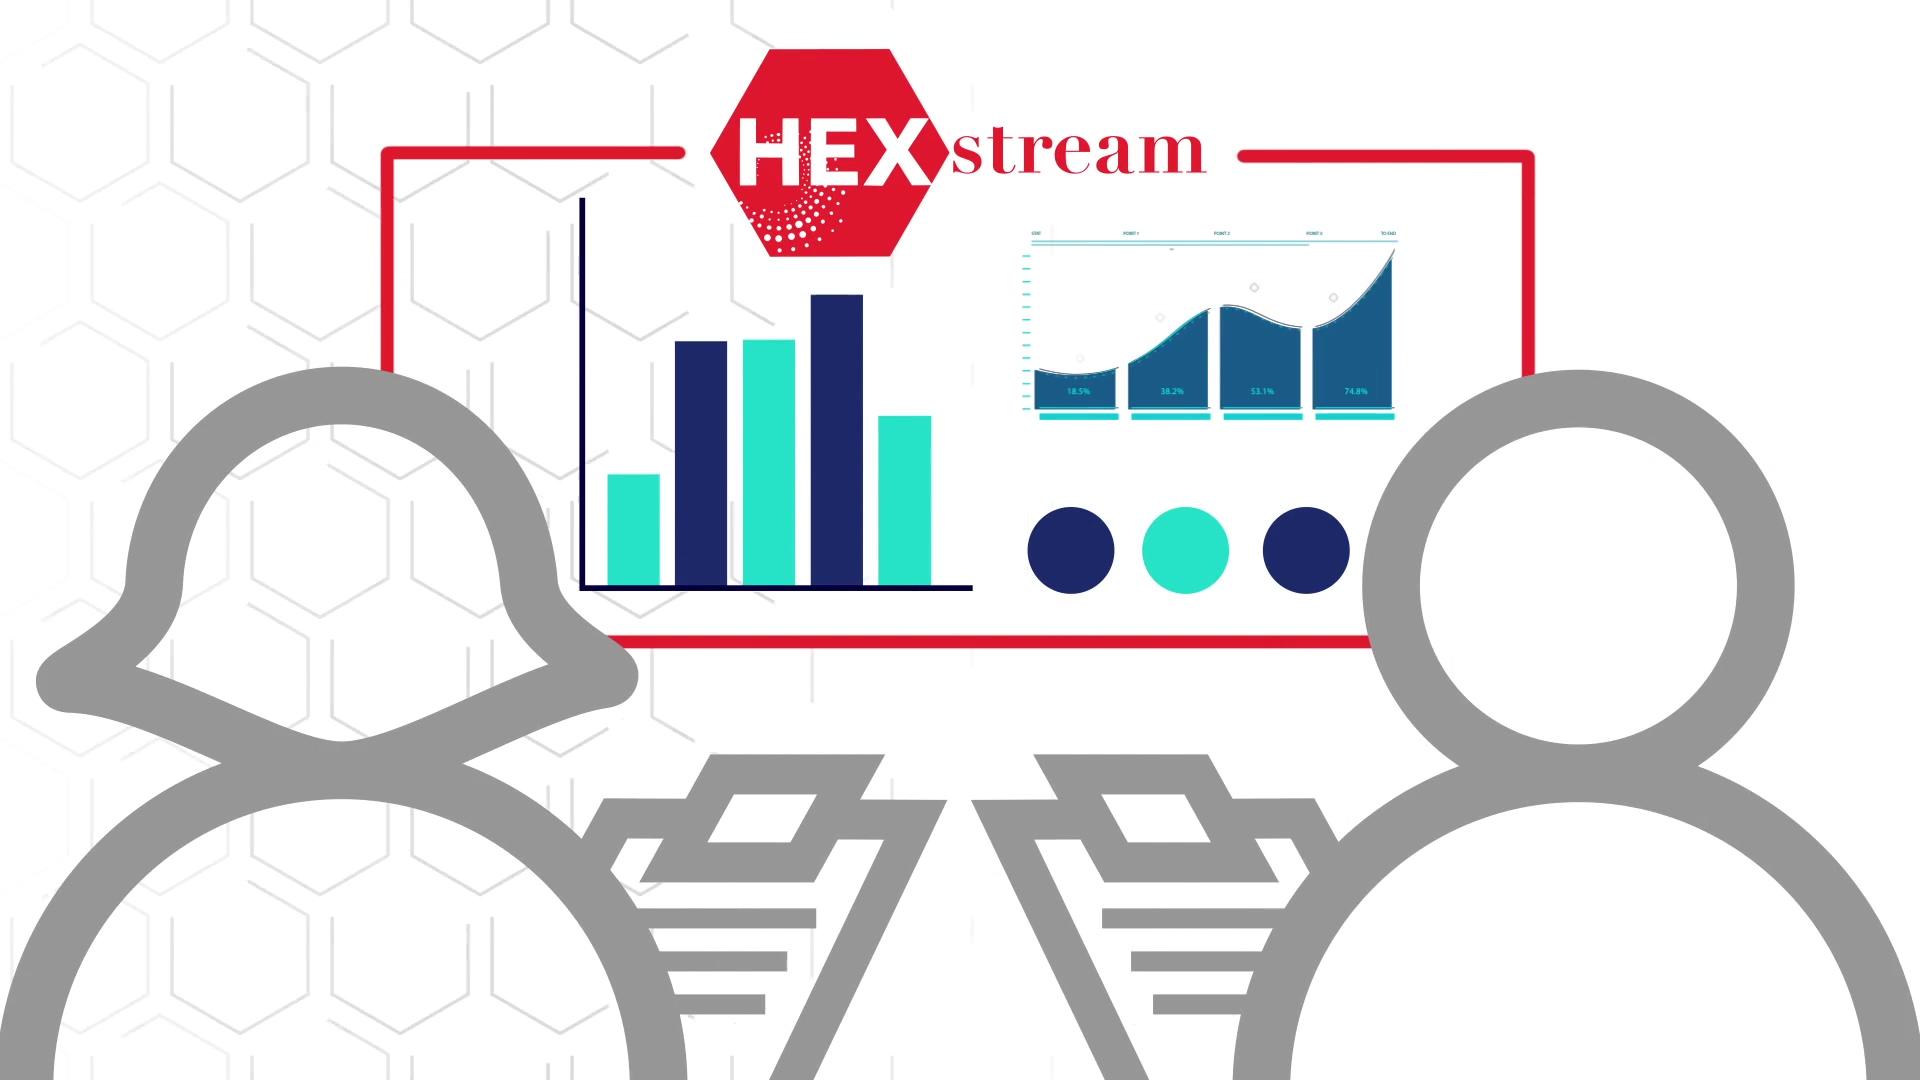 short hexstream video